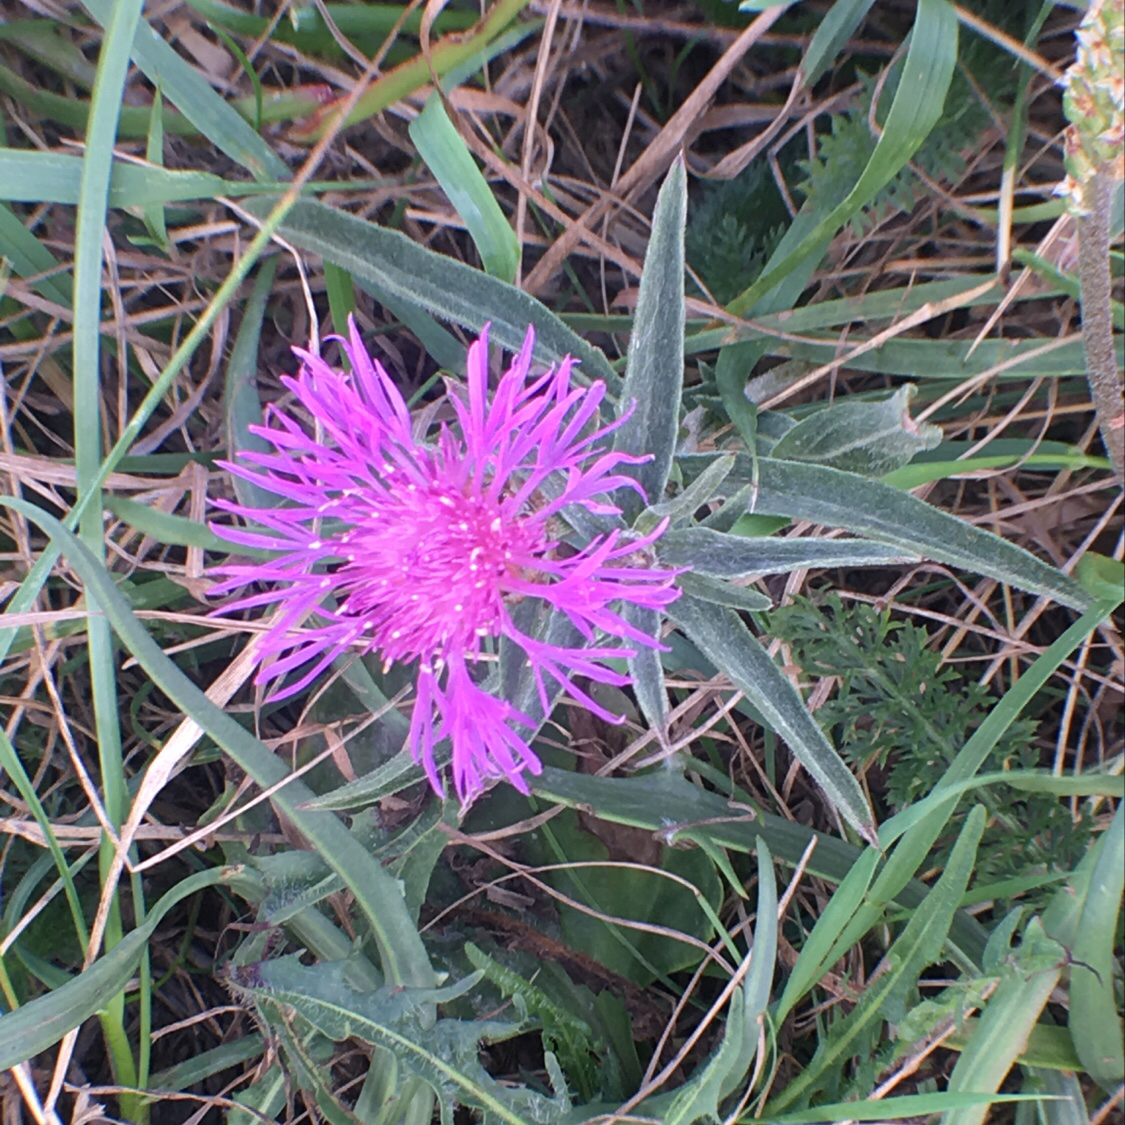 Almindelig Knopurt (Centaurea jacea)